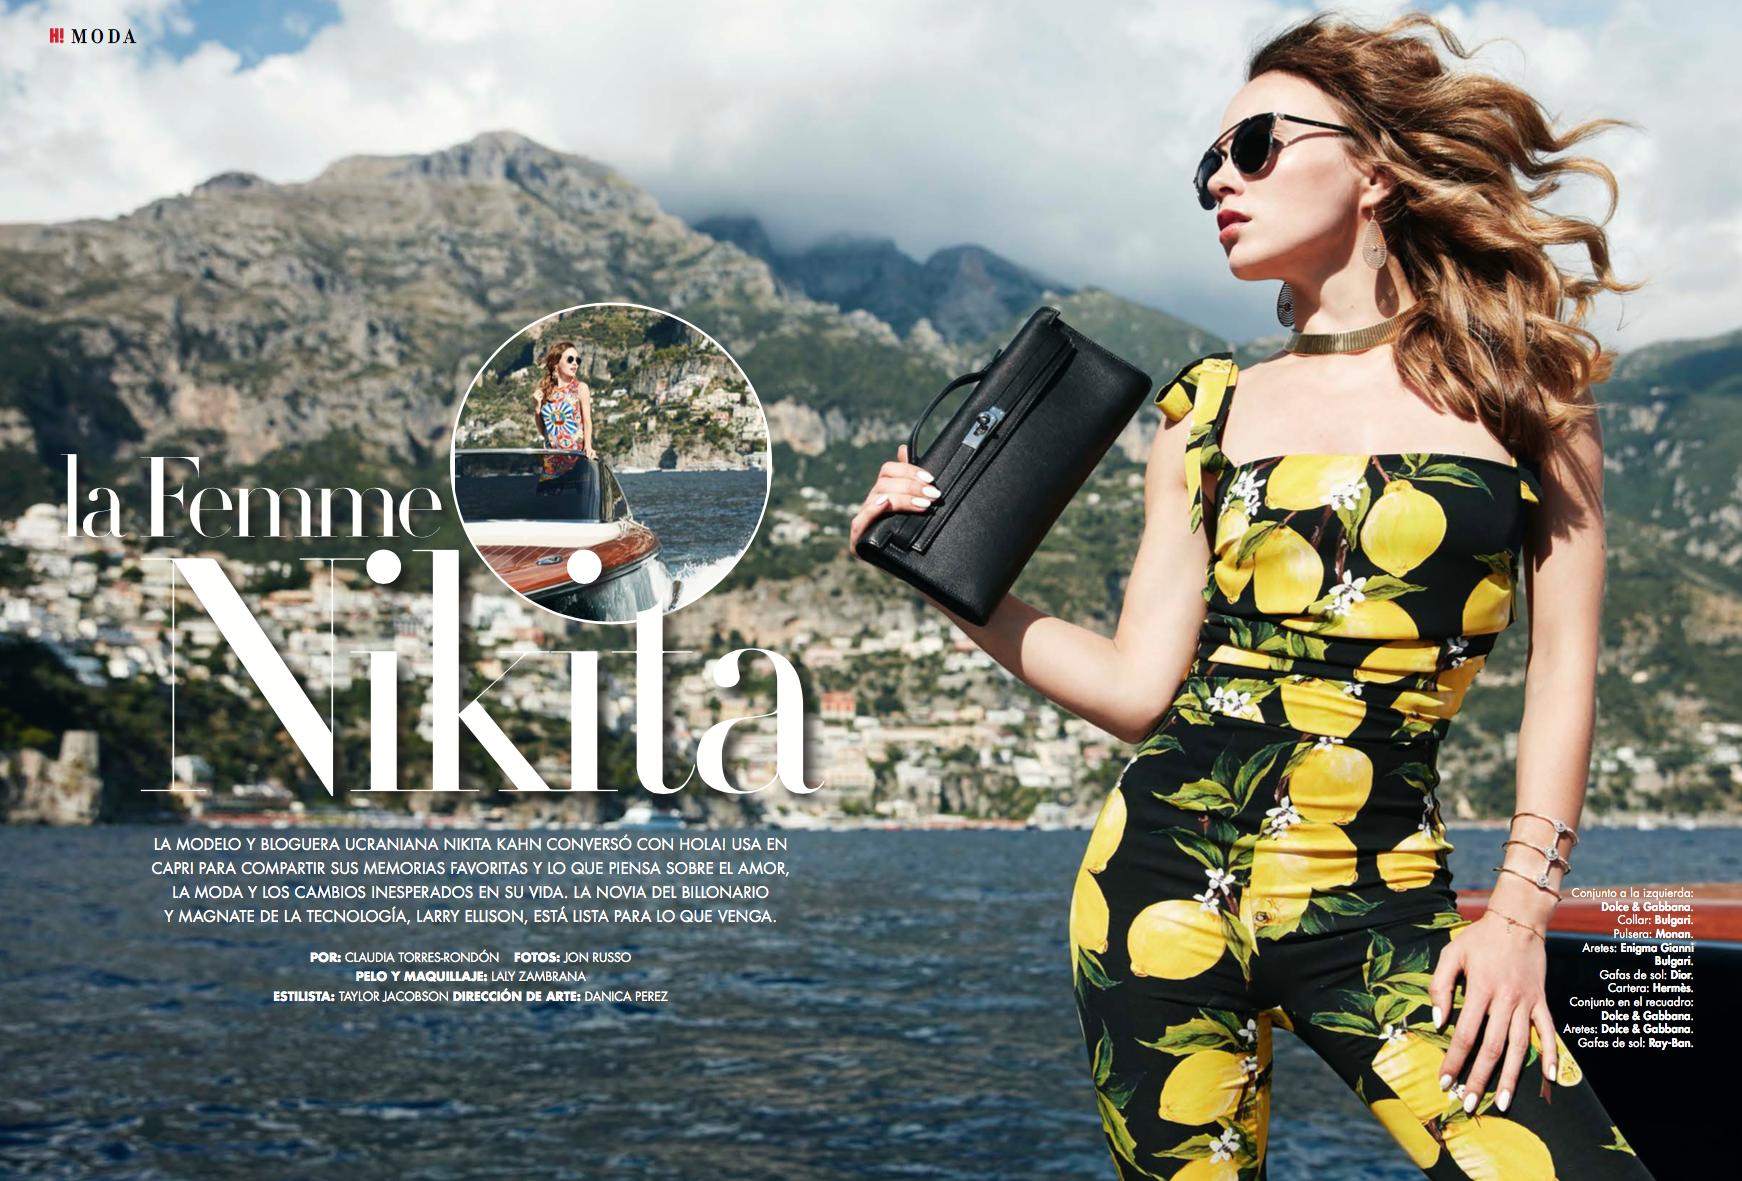 Nikita Kahn_Hola Magazine_Feature Interview_NKHerLifestyle.png